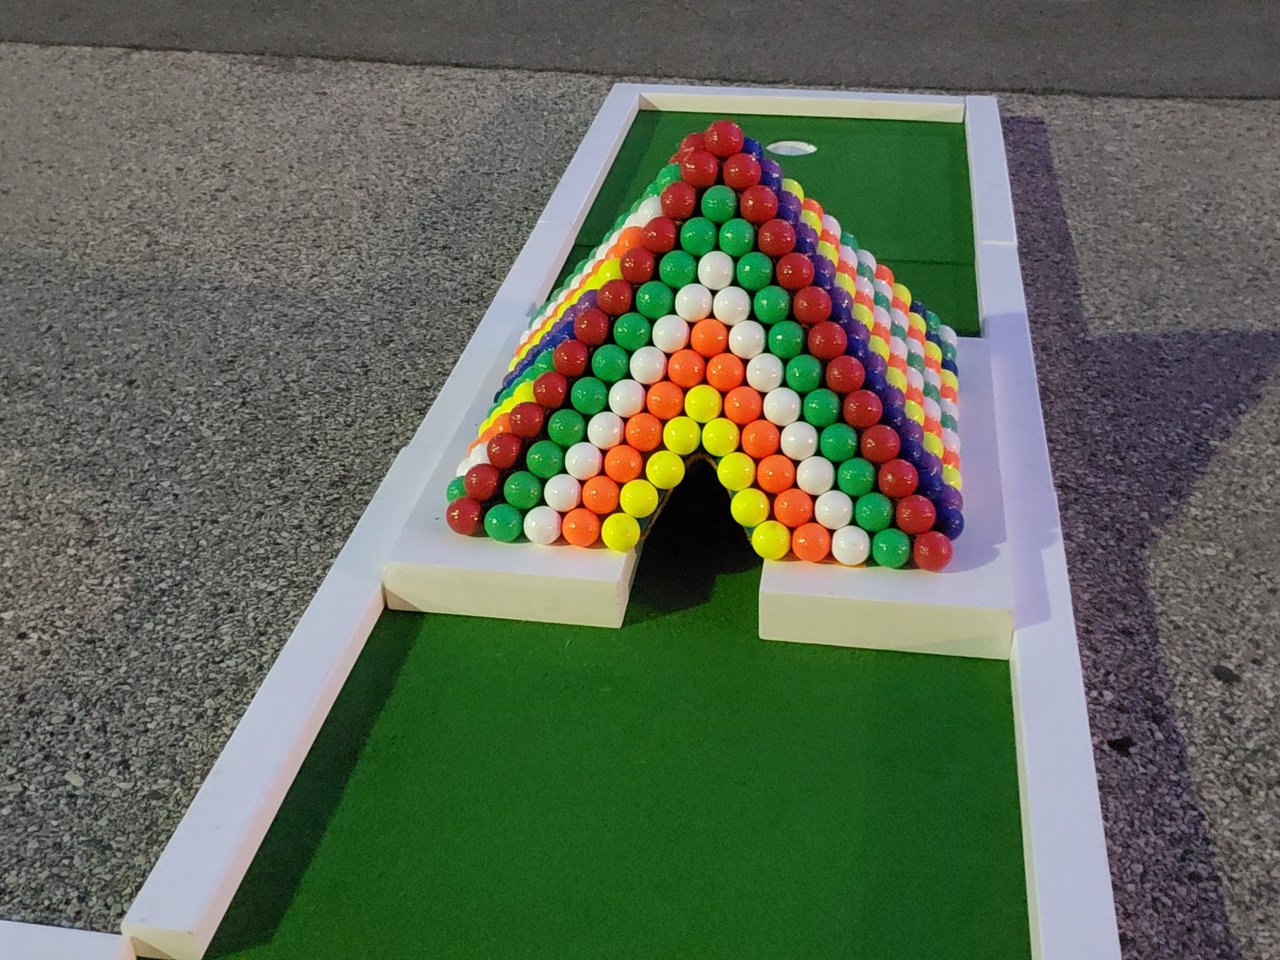 Thomas Jefferson University Welcome Week photo Mini-Golf-Rental-Philly-Rainbow-Pyramid-Obstacle.jpg